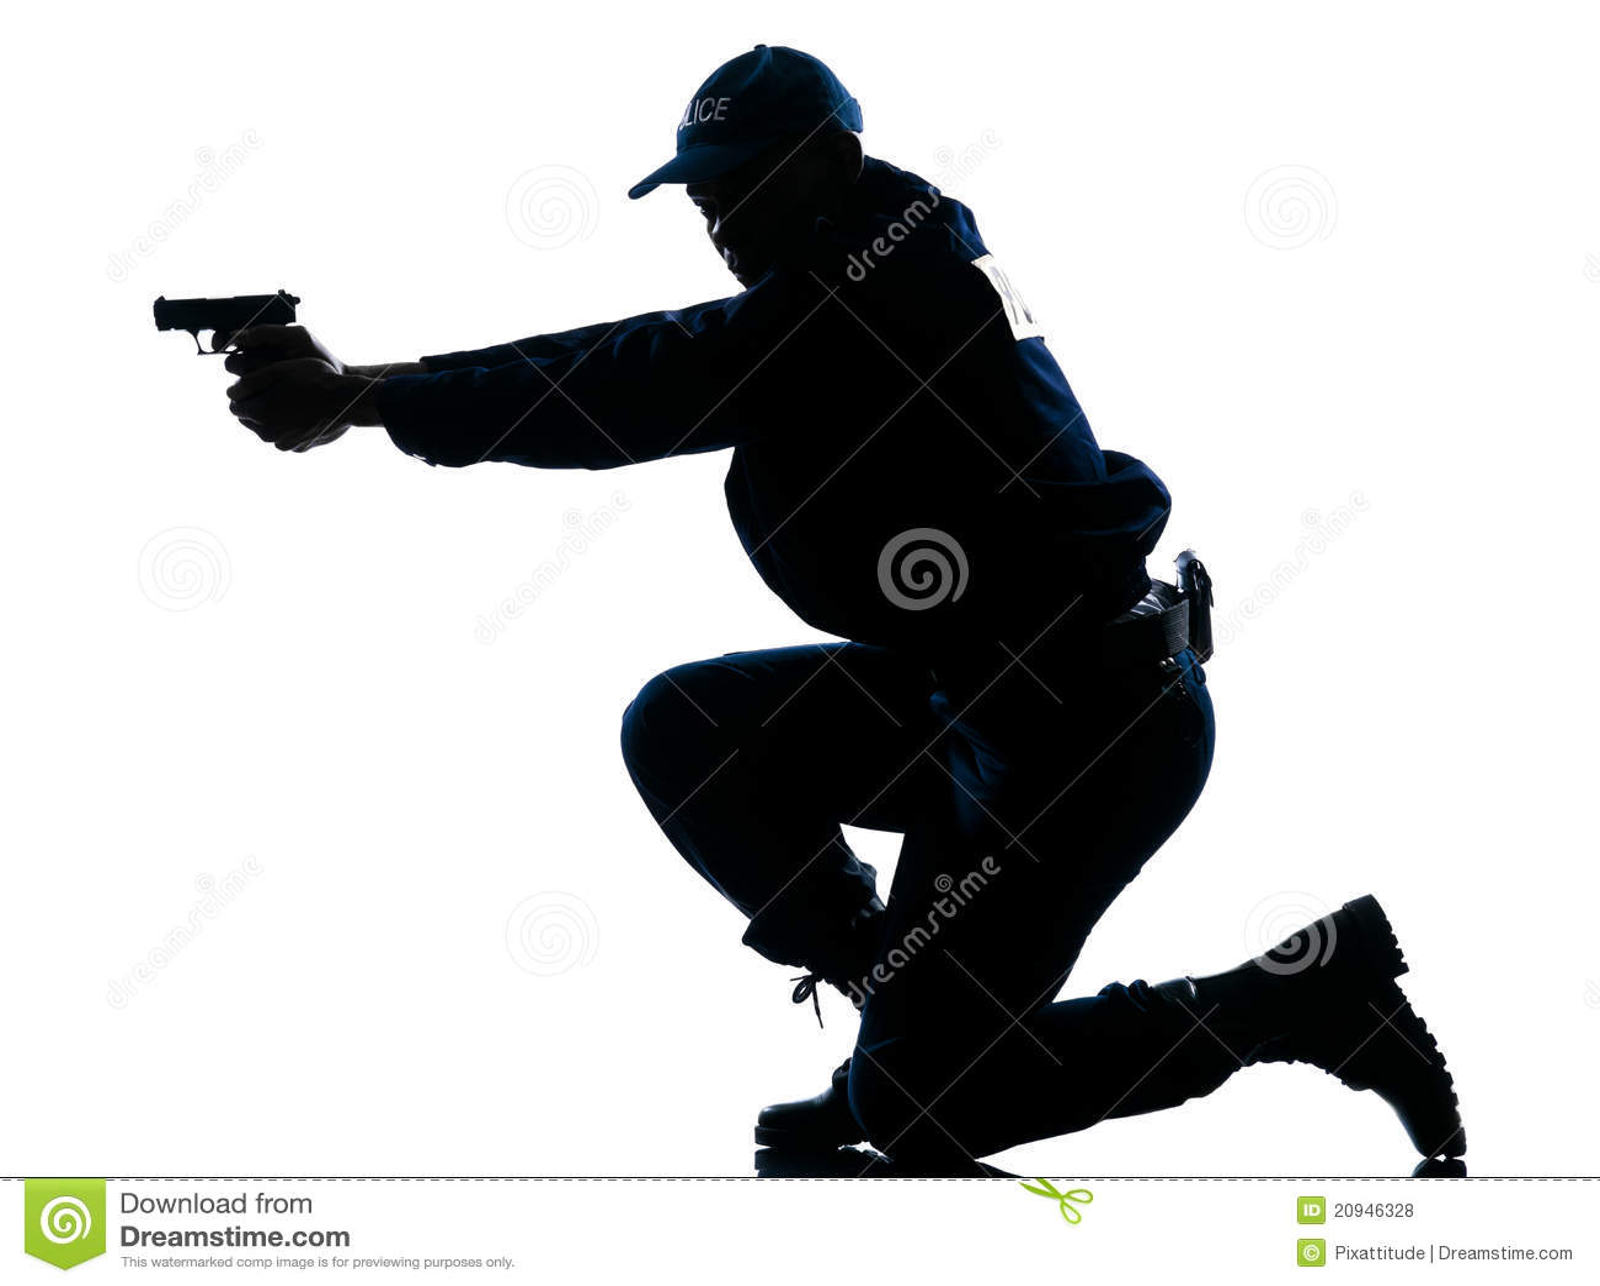 Police Officer Aiming Gun Royalty - 69.8KB